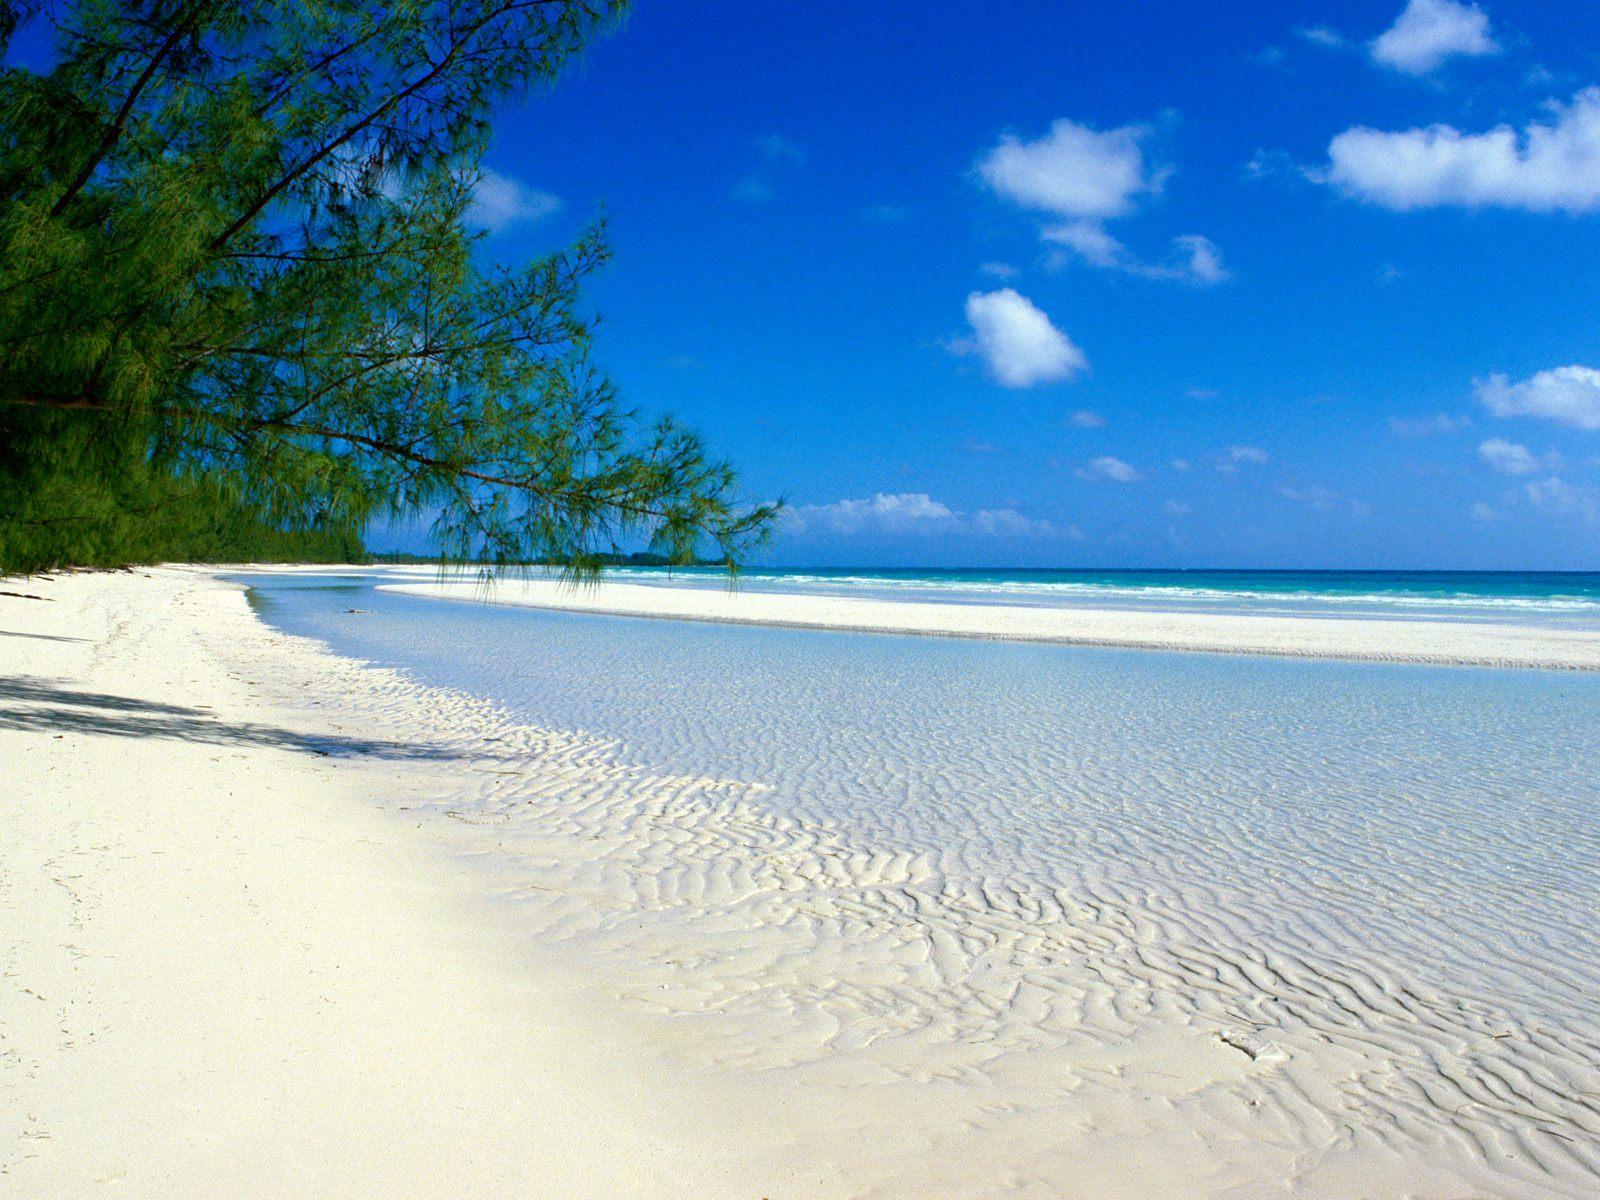 http://4.bp.blogspot.com/_ZVl3g4WfT_M/S93k9JC8gII/AAAAAAAAD1I/6QvZpQNtN7Y/s1600/bahamas+beach.jpg